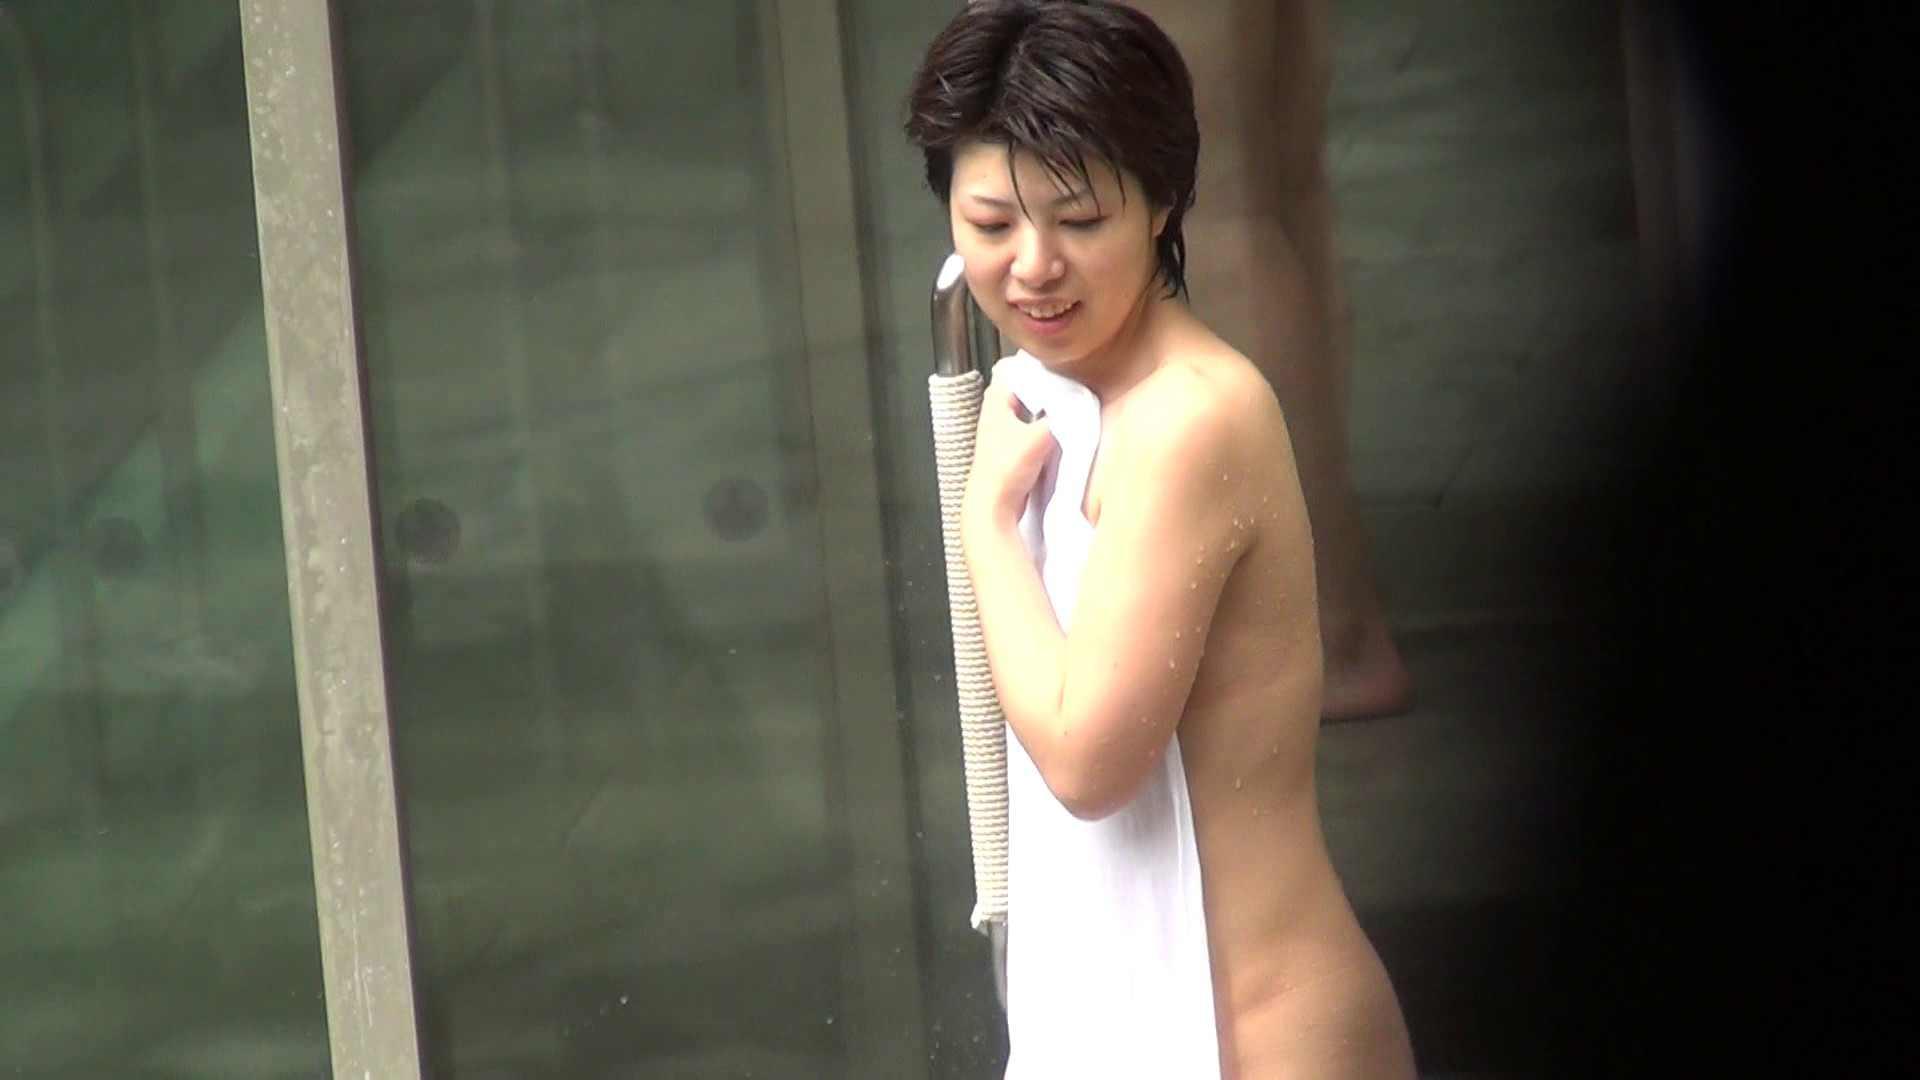 Aquaな露天風呂Vol.312 露天風呂編  88PIX 52